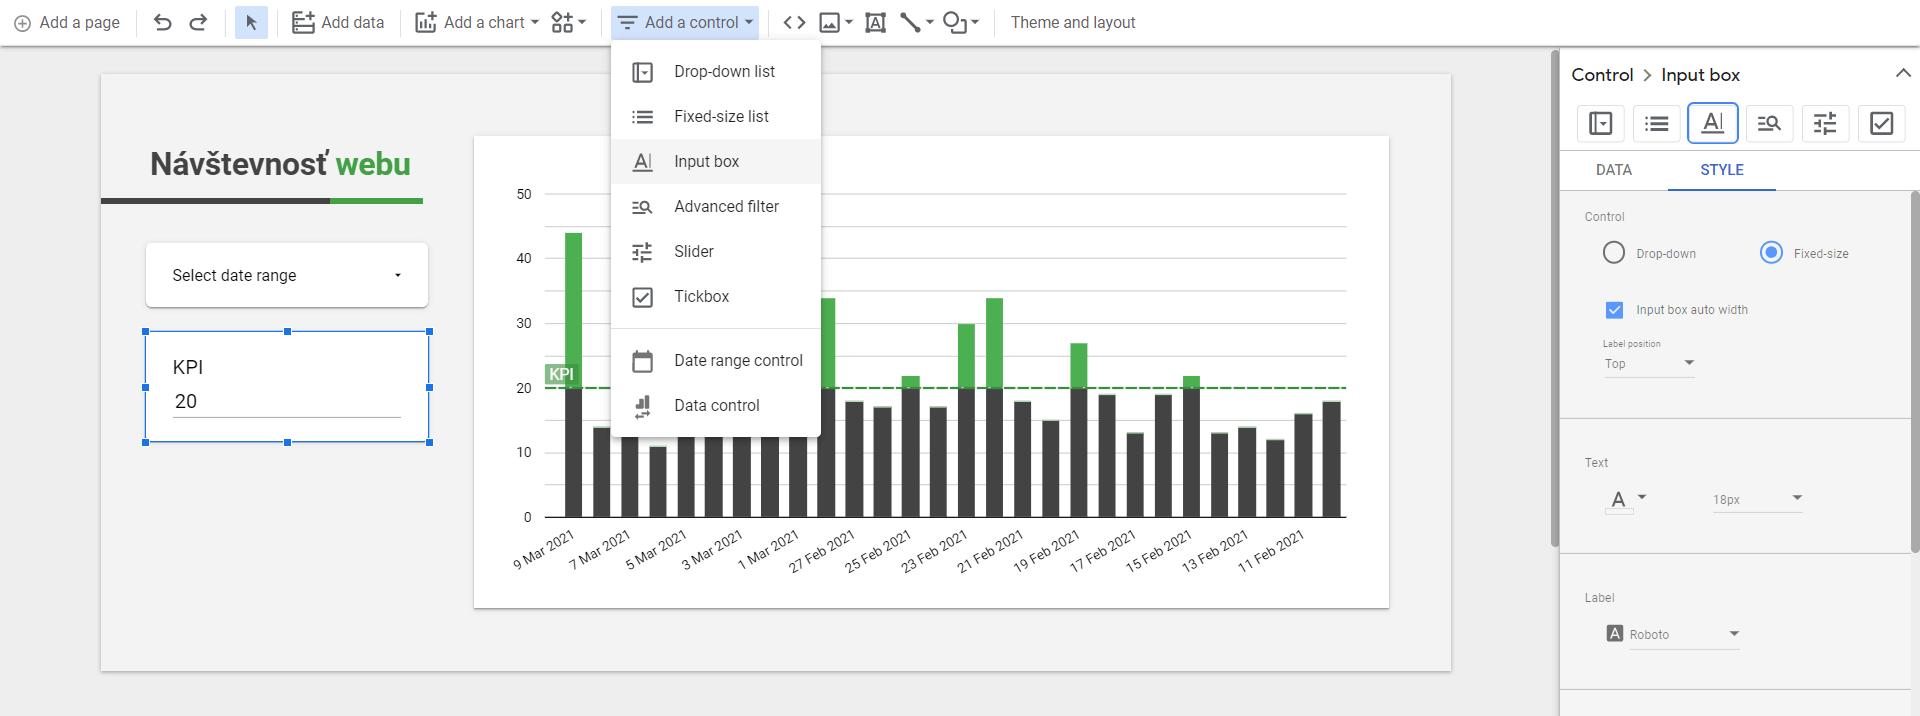 input box data studio